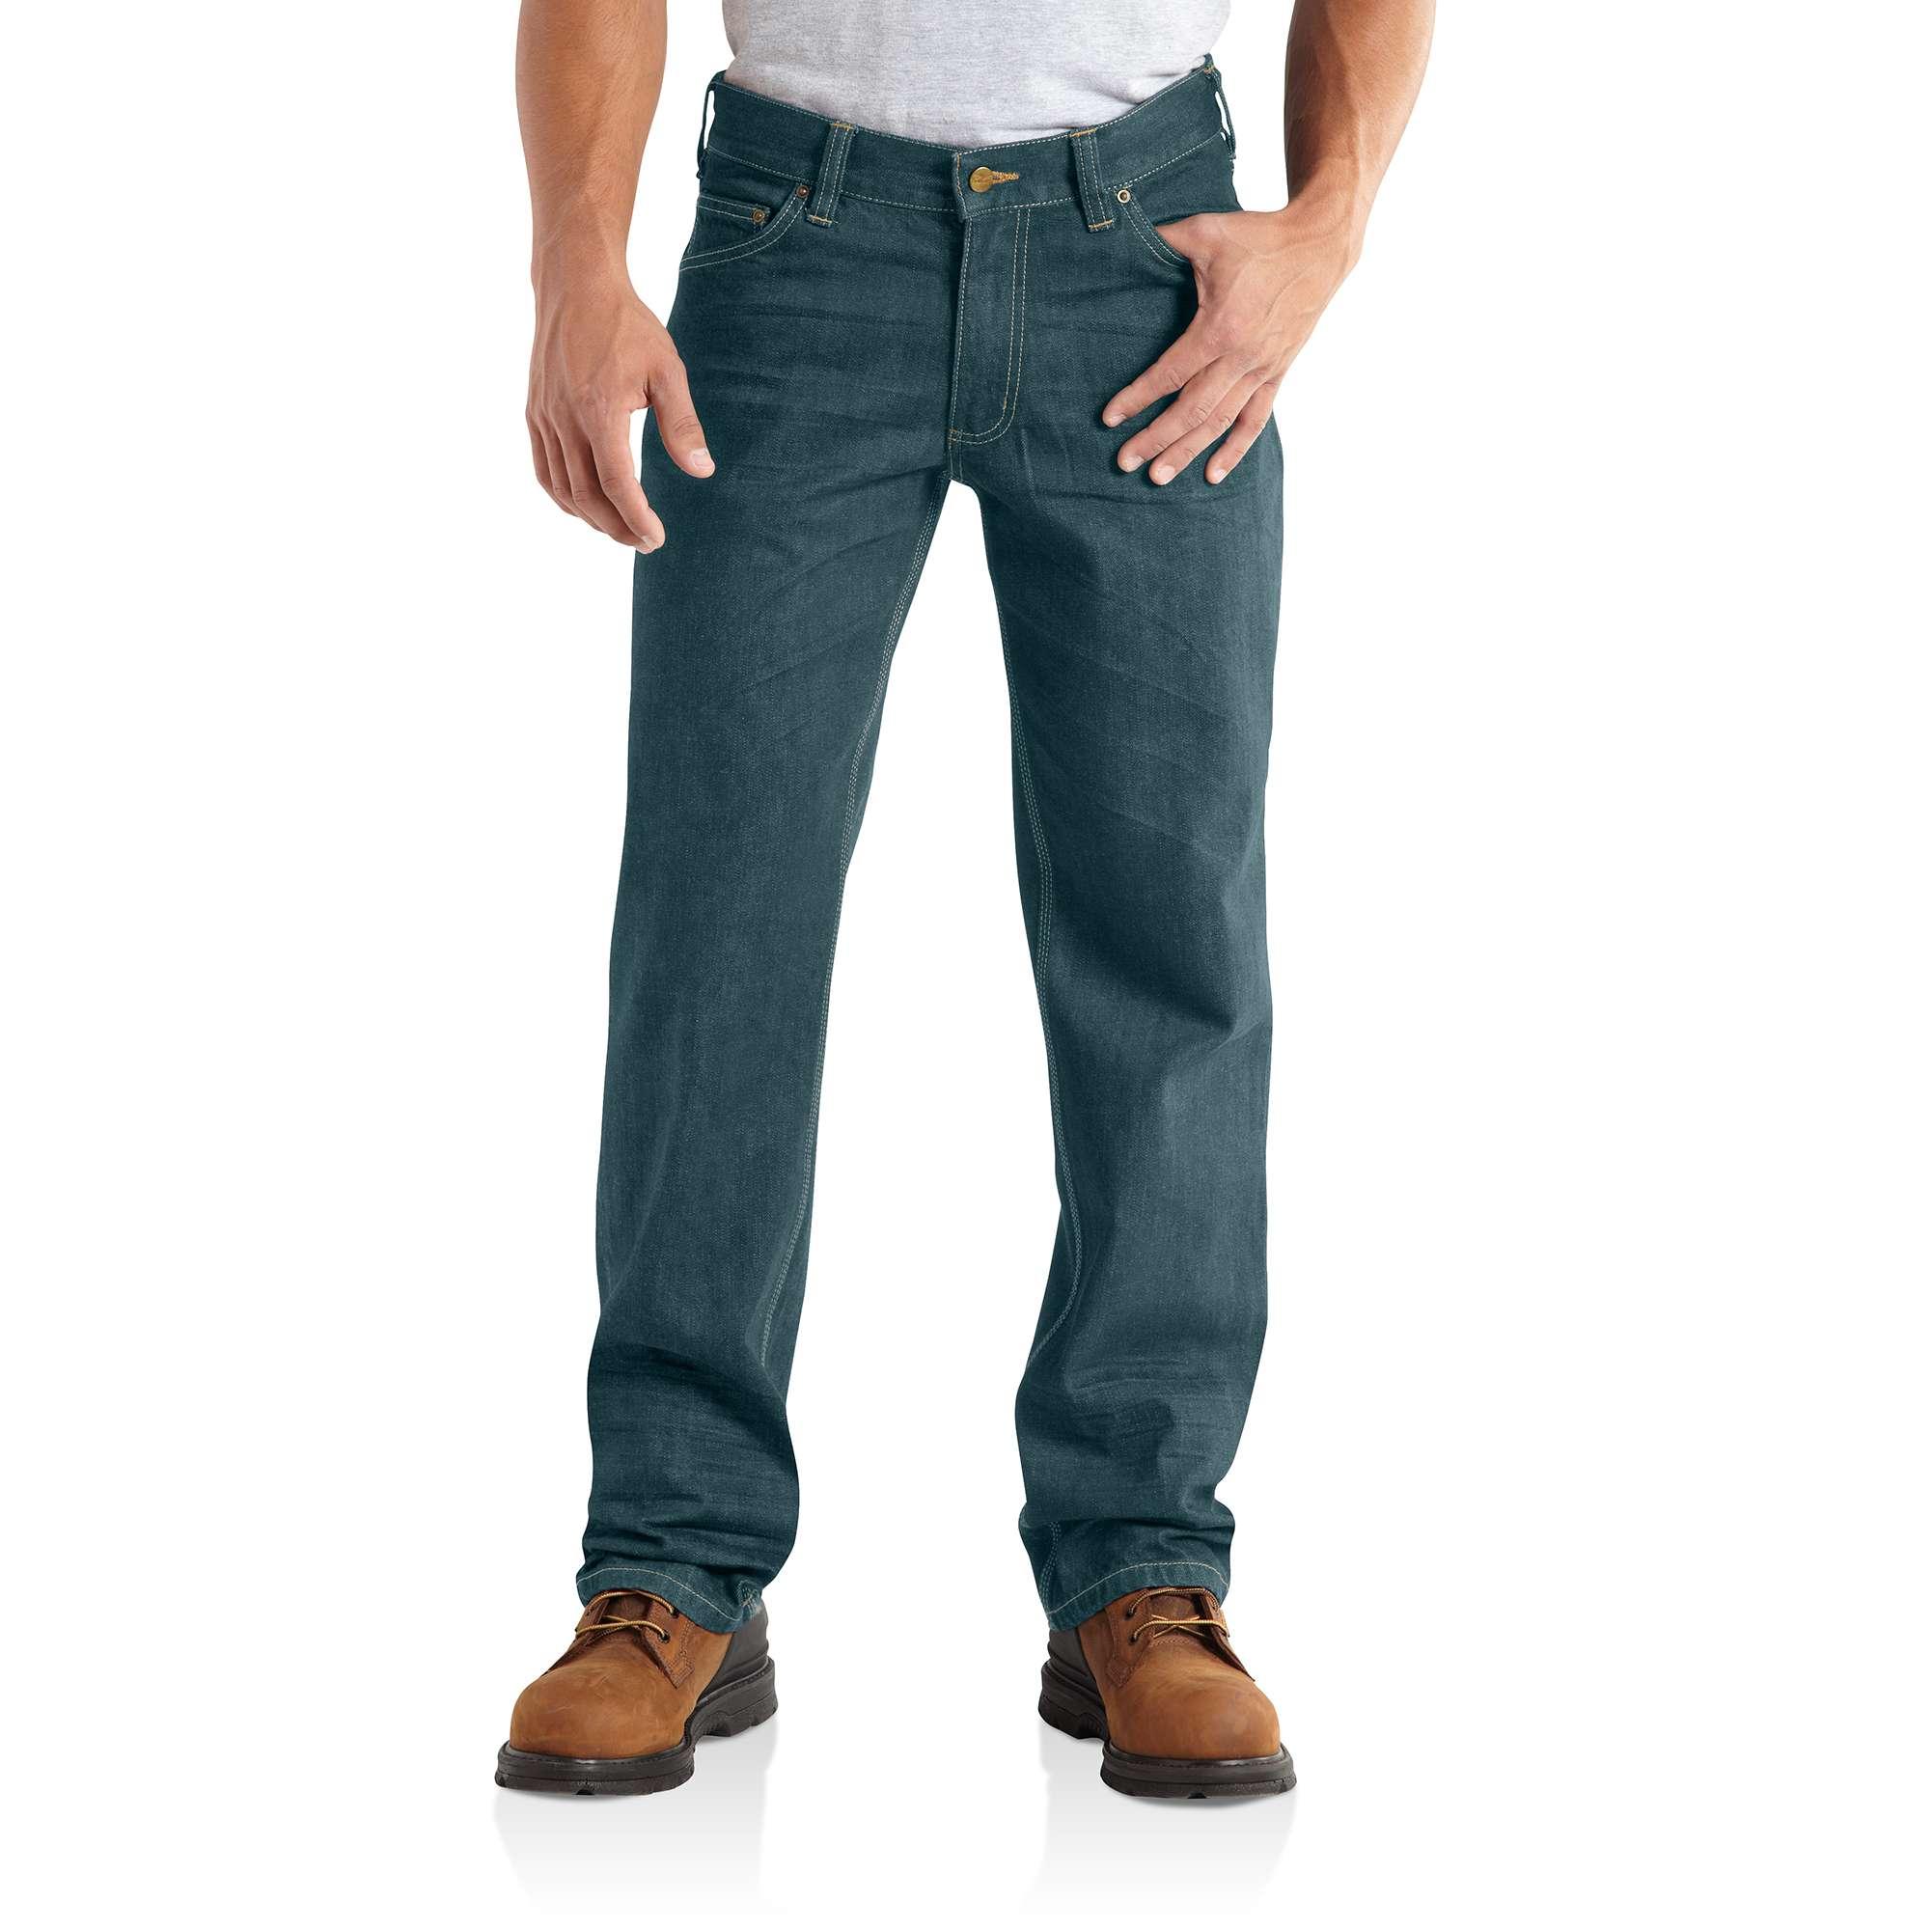 Carhartt Series 1889 Loose-Fit Straight Leg Jean